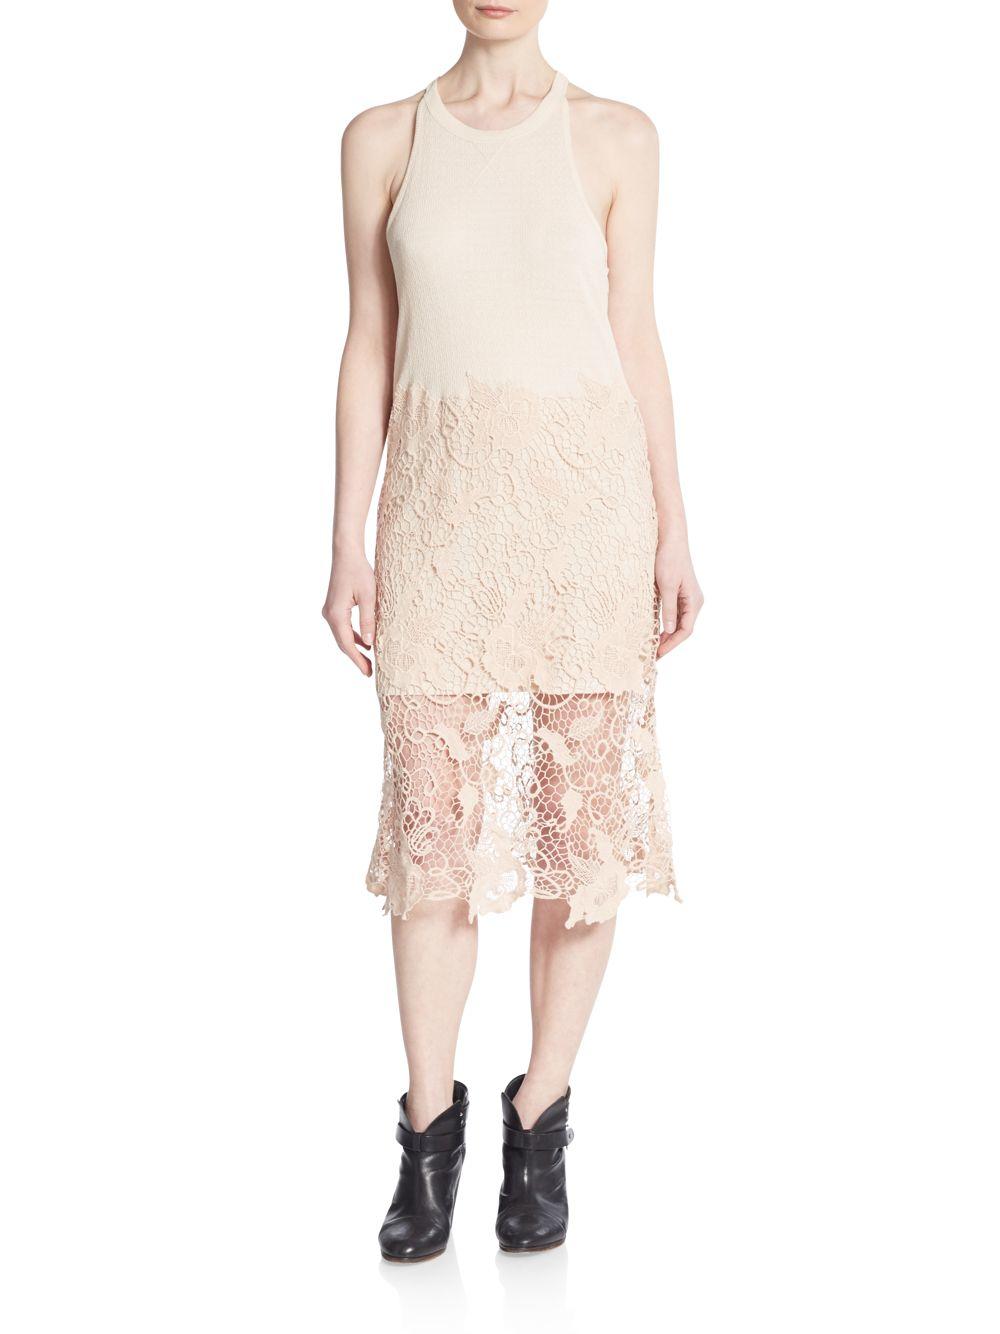 Nora Lace Overlay Tank Dress